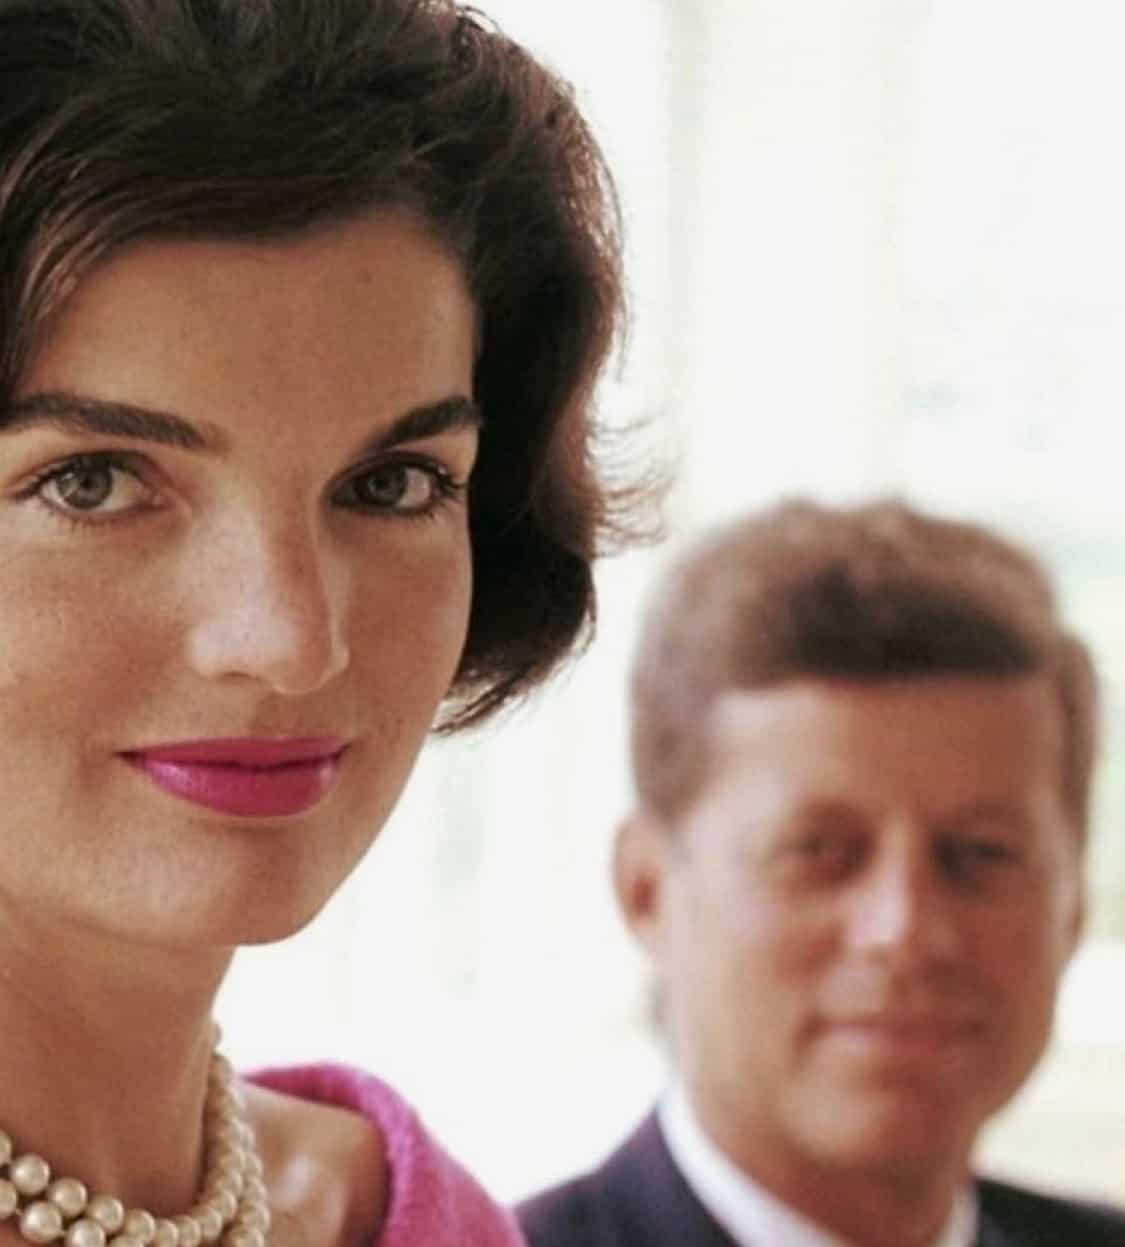 Jacqueline Bouvier Kennedy avrebbe oggi 90 anni